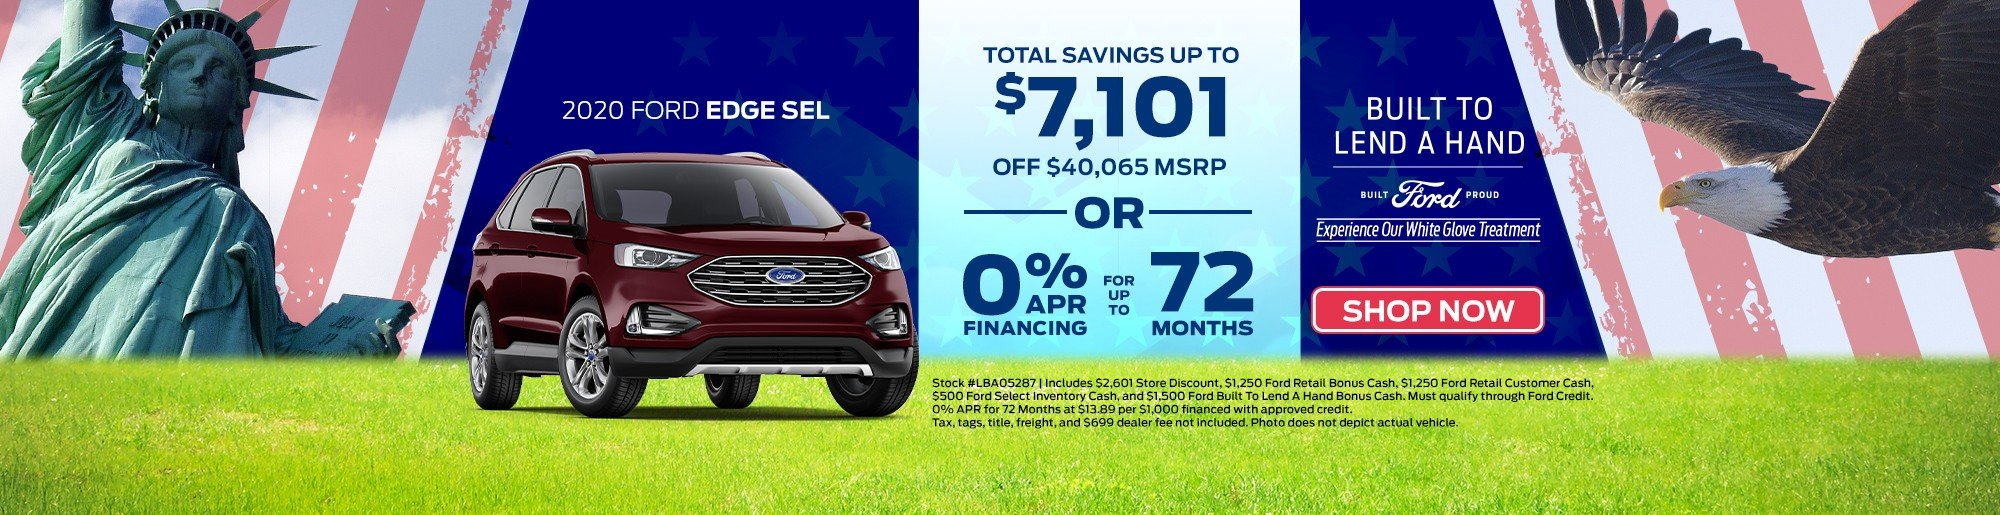 Save new Ford Edge Key Scales Ford Leesburg, FL